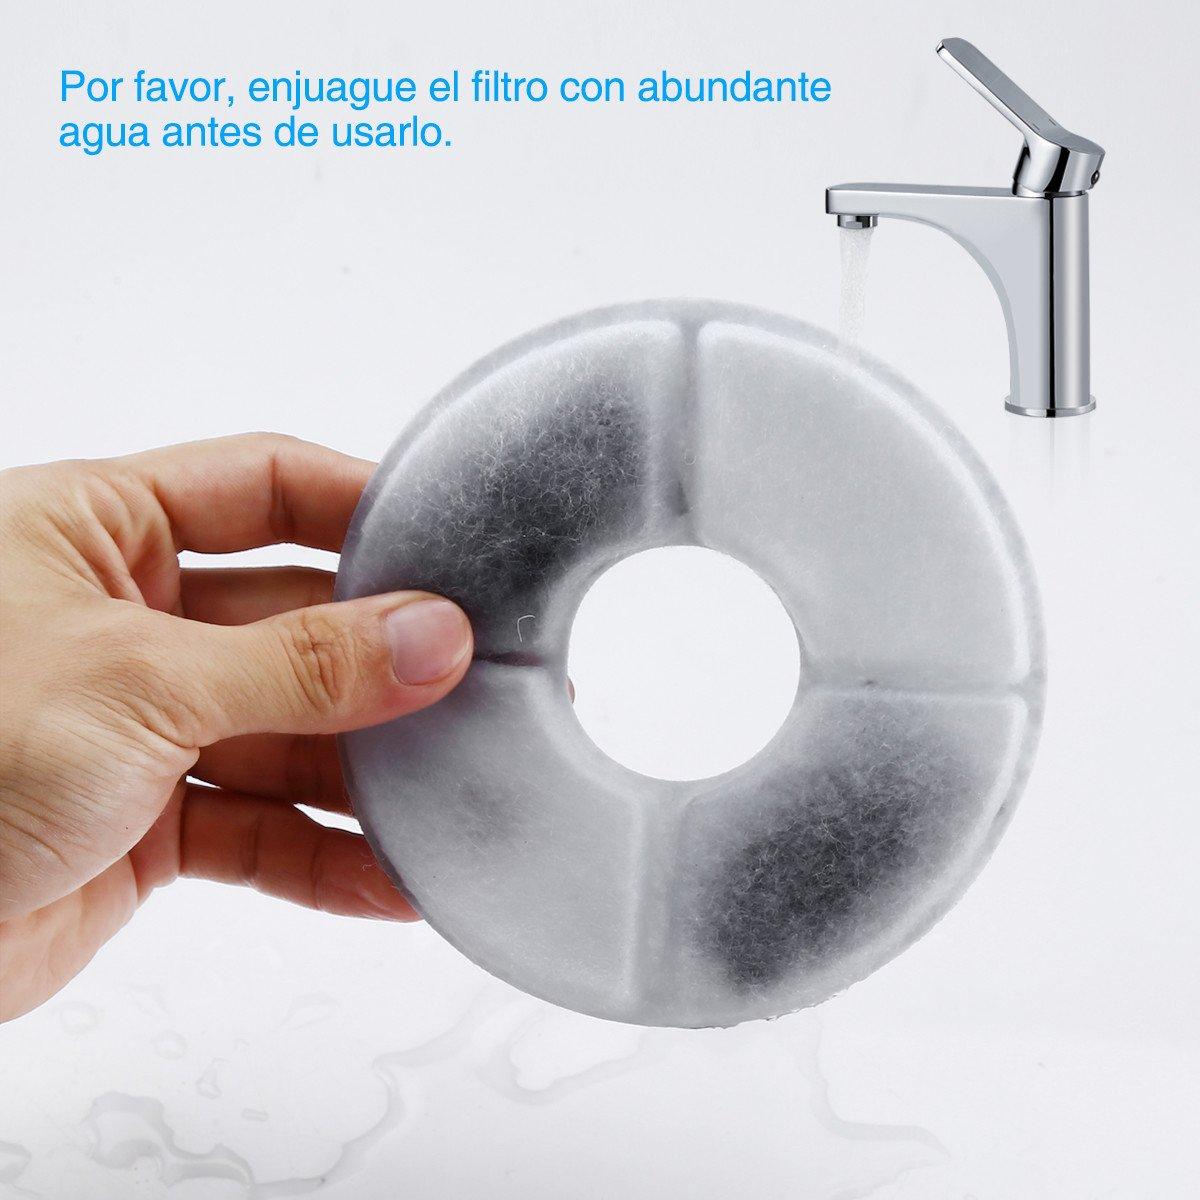 isYoung Fuente de Mascota Dispensador de Agua Automático Filtros de Carbón Activado Premium Paquete de 4, Filtros de Fuente para Mascotas